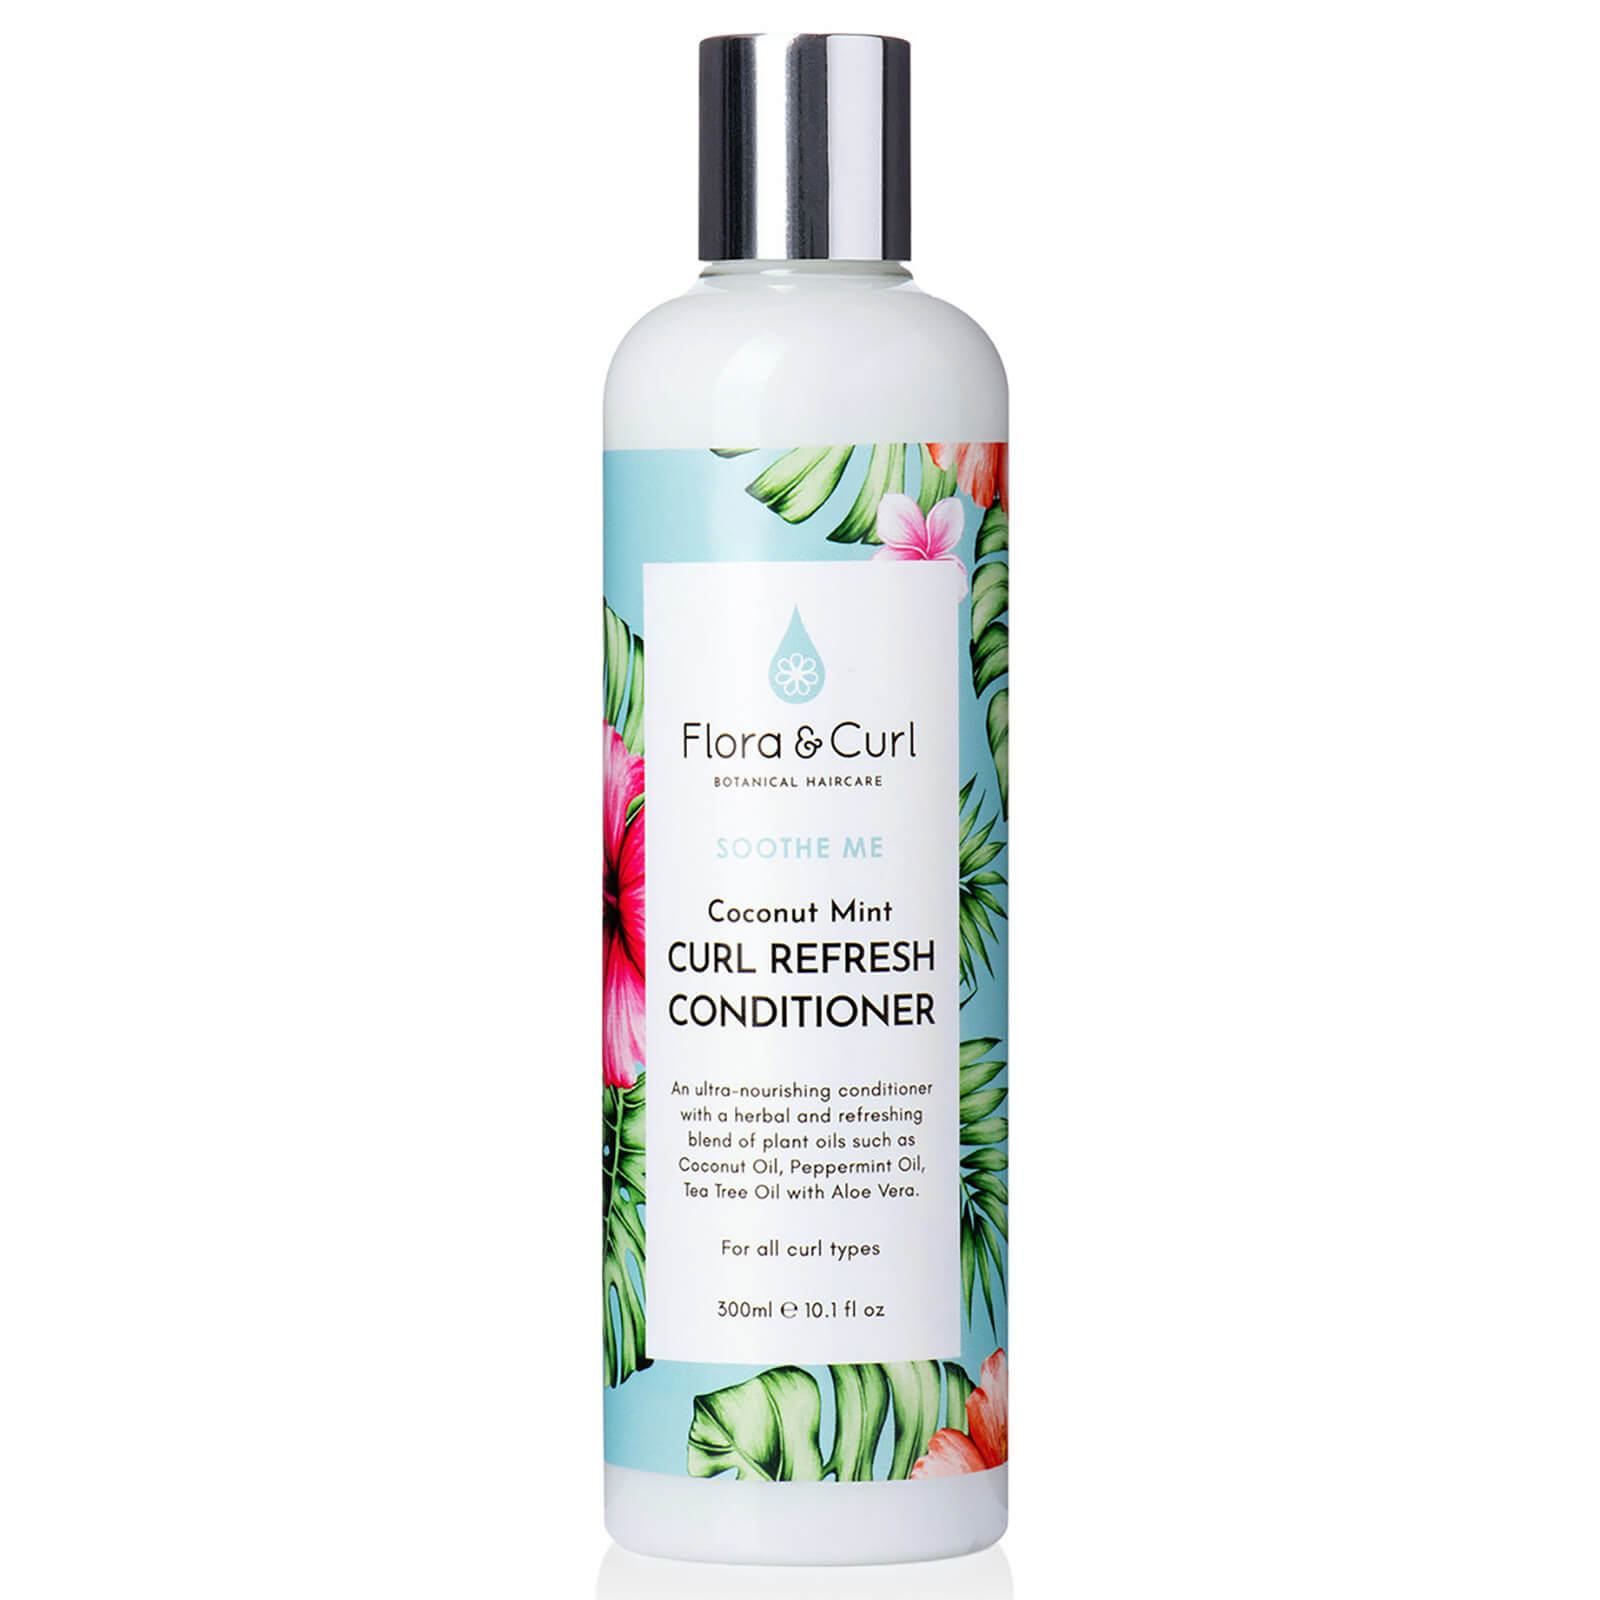 Flora & Curl Coconut Mint Curl Refresh Conditioner 300ml  - Купить